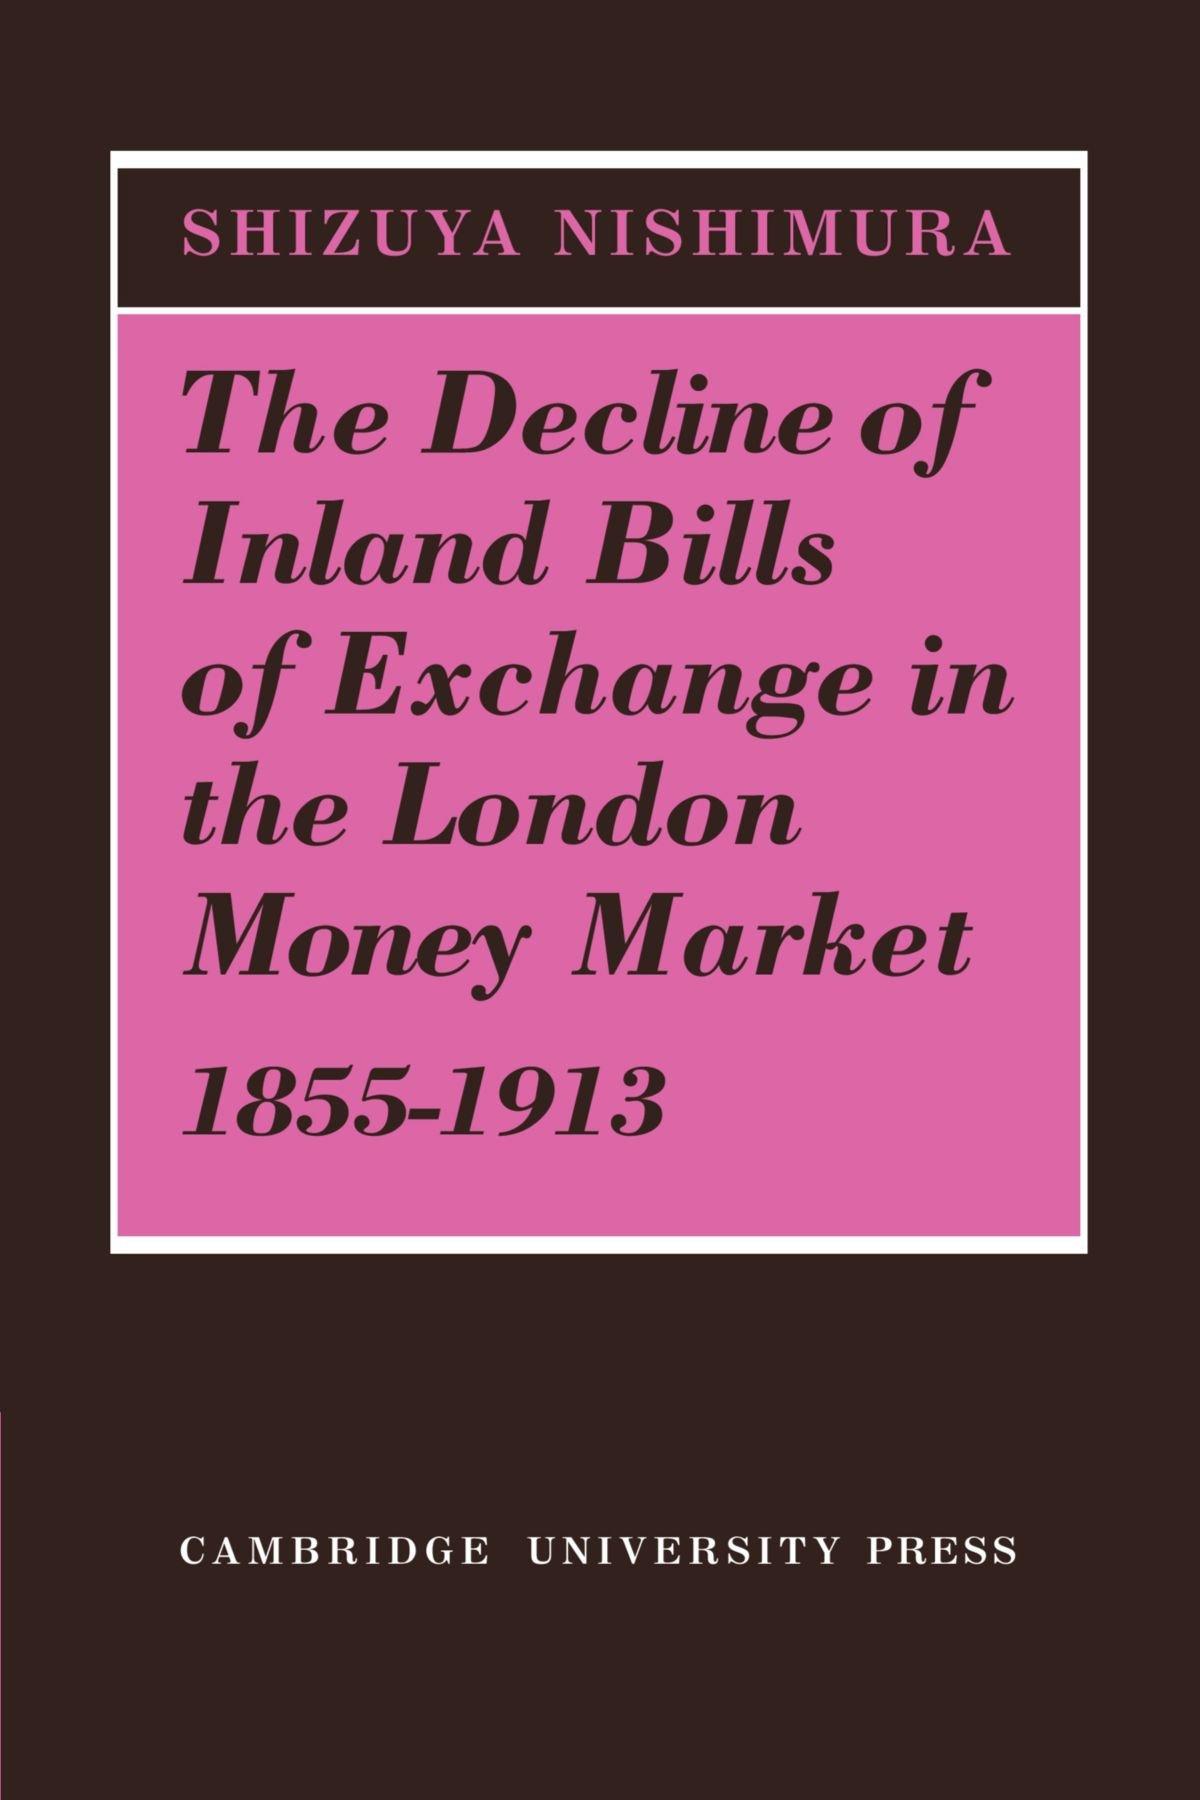 Download The Decline of Inland Bills of Exchange in the London Money Market 1855-1913 pdf epub